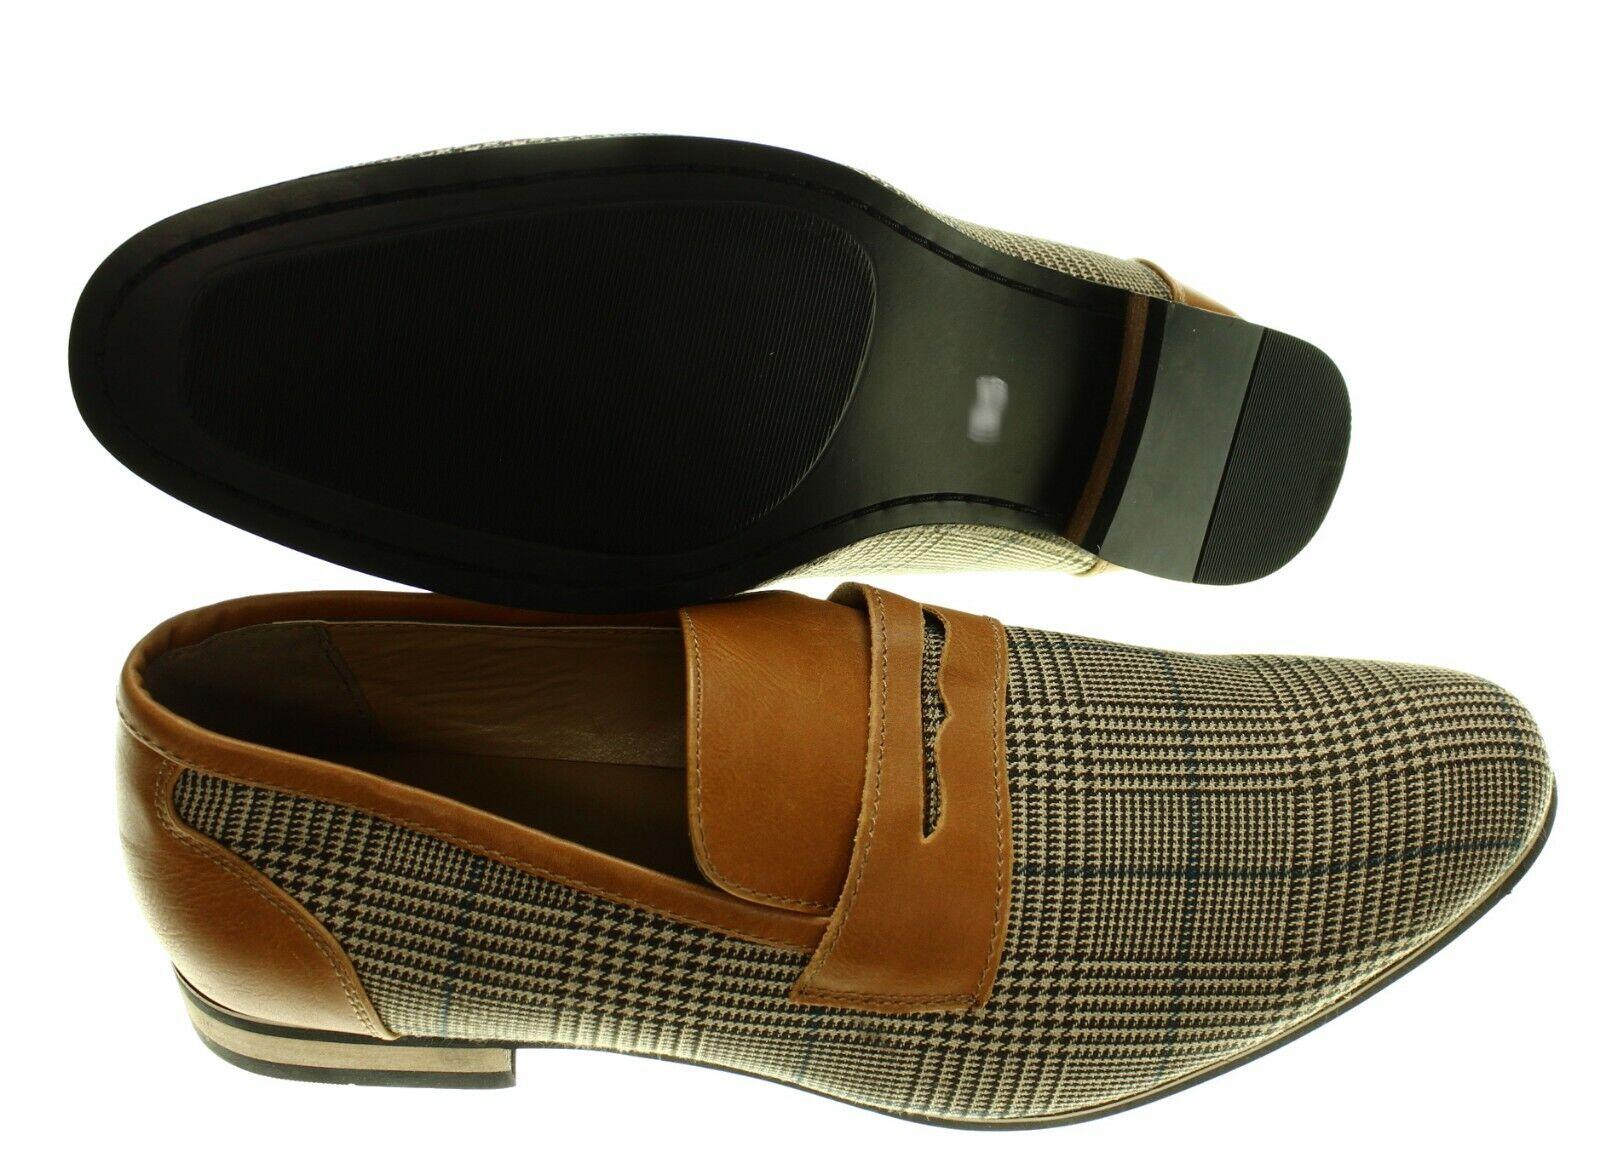 NEW - STEVE HARVEY Men's PENNY LOAFER Brown PLAID DRESS SHOES - US 9